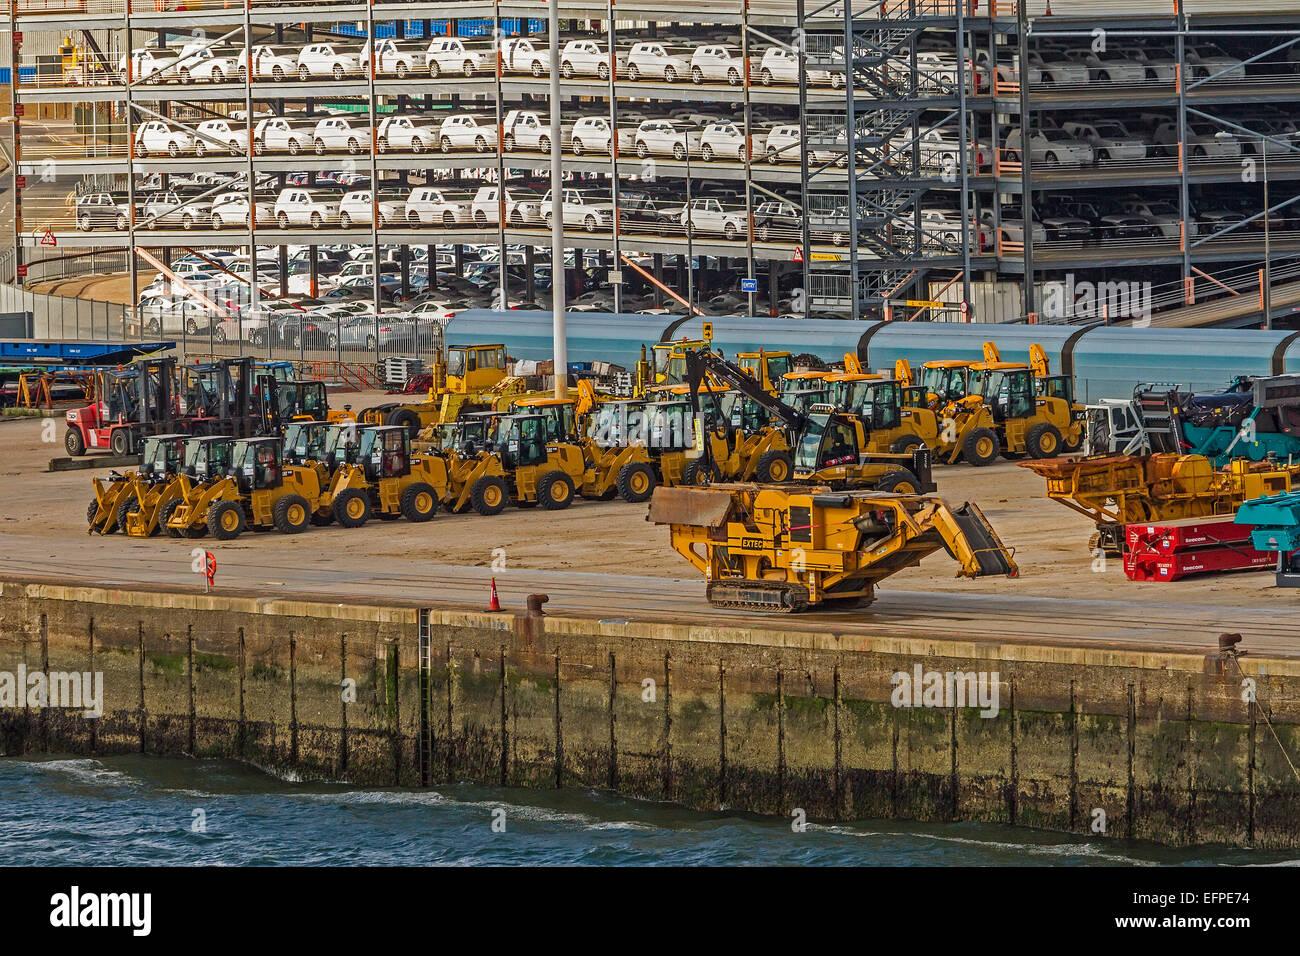 Vehiicles For Export The Dock Southampton UK - Stock Image